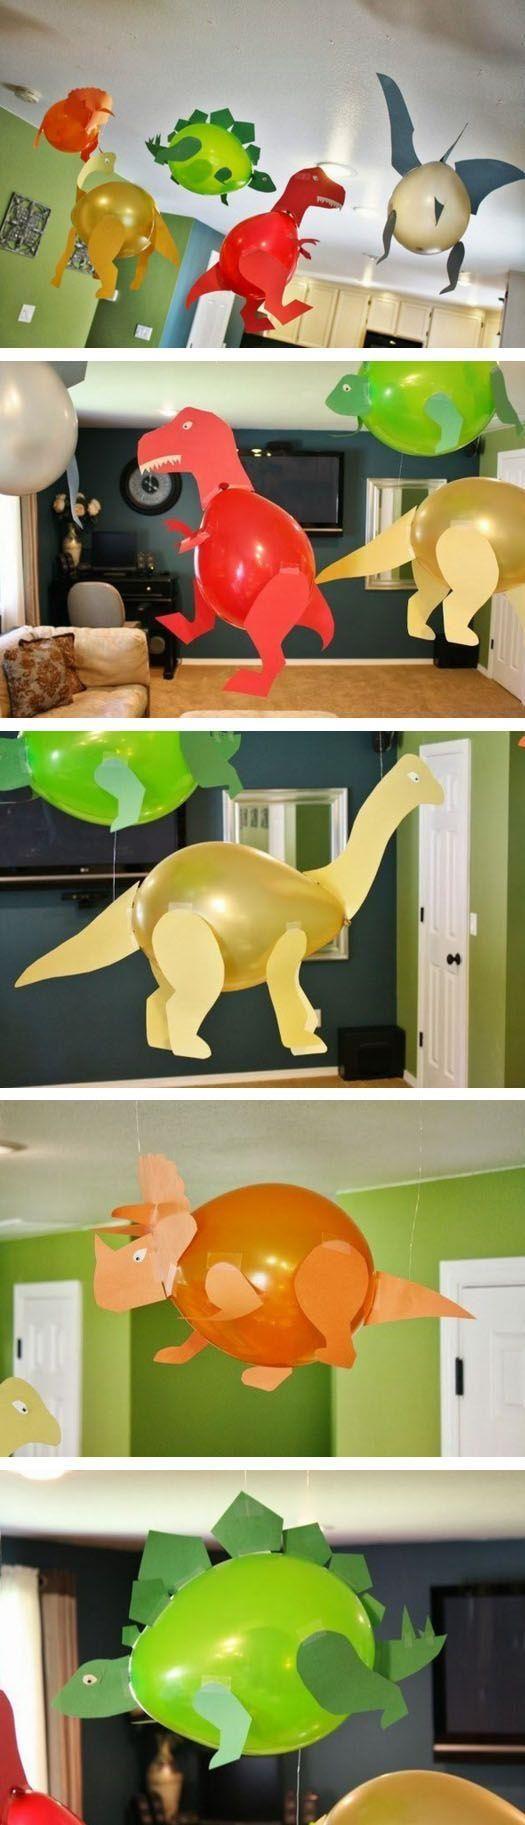 Geburtstag: Luftballons Dinos basteln.